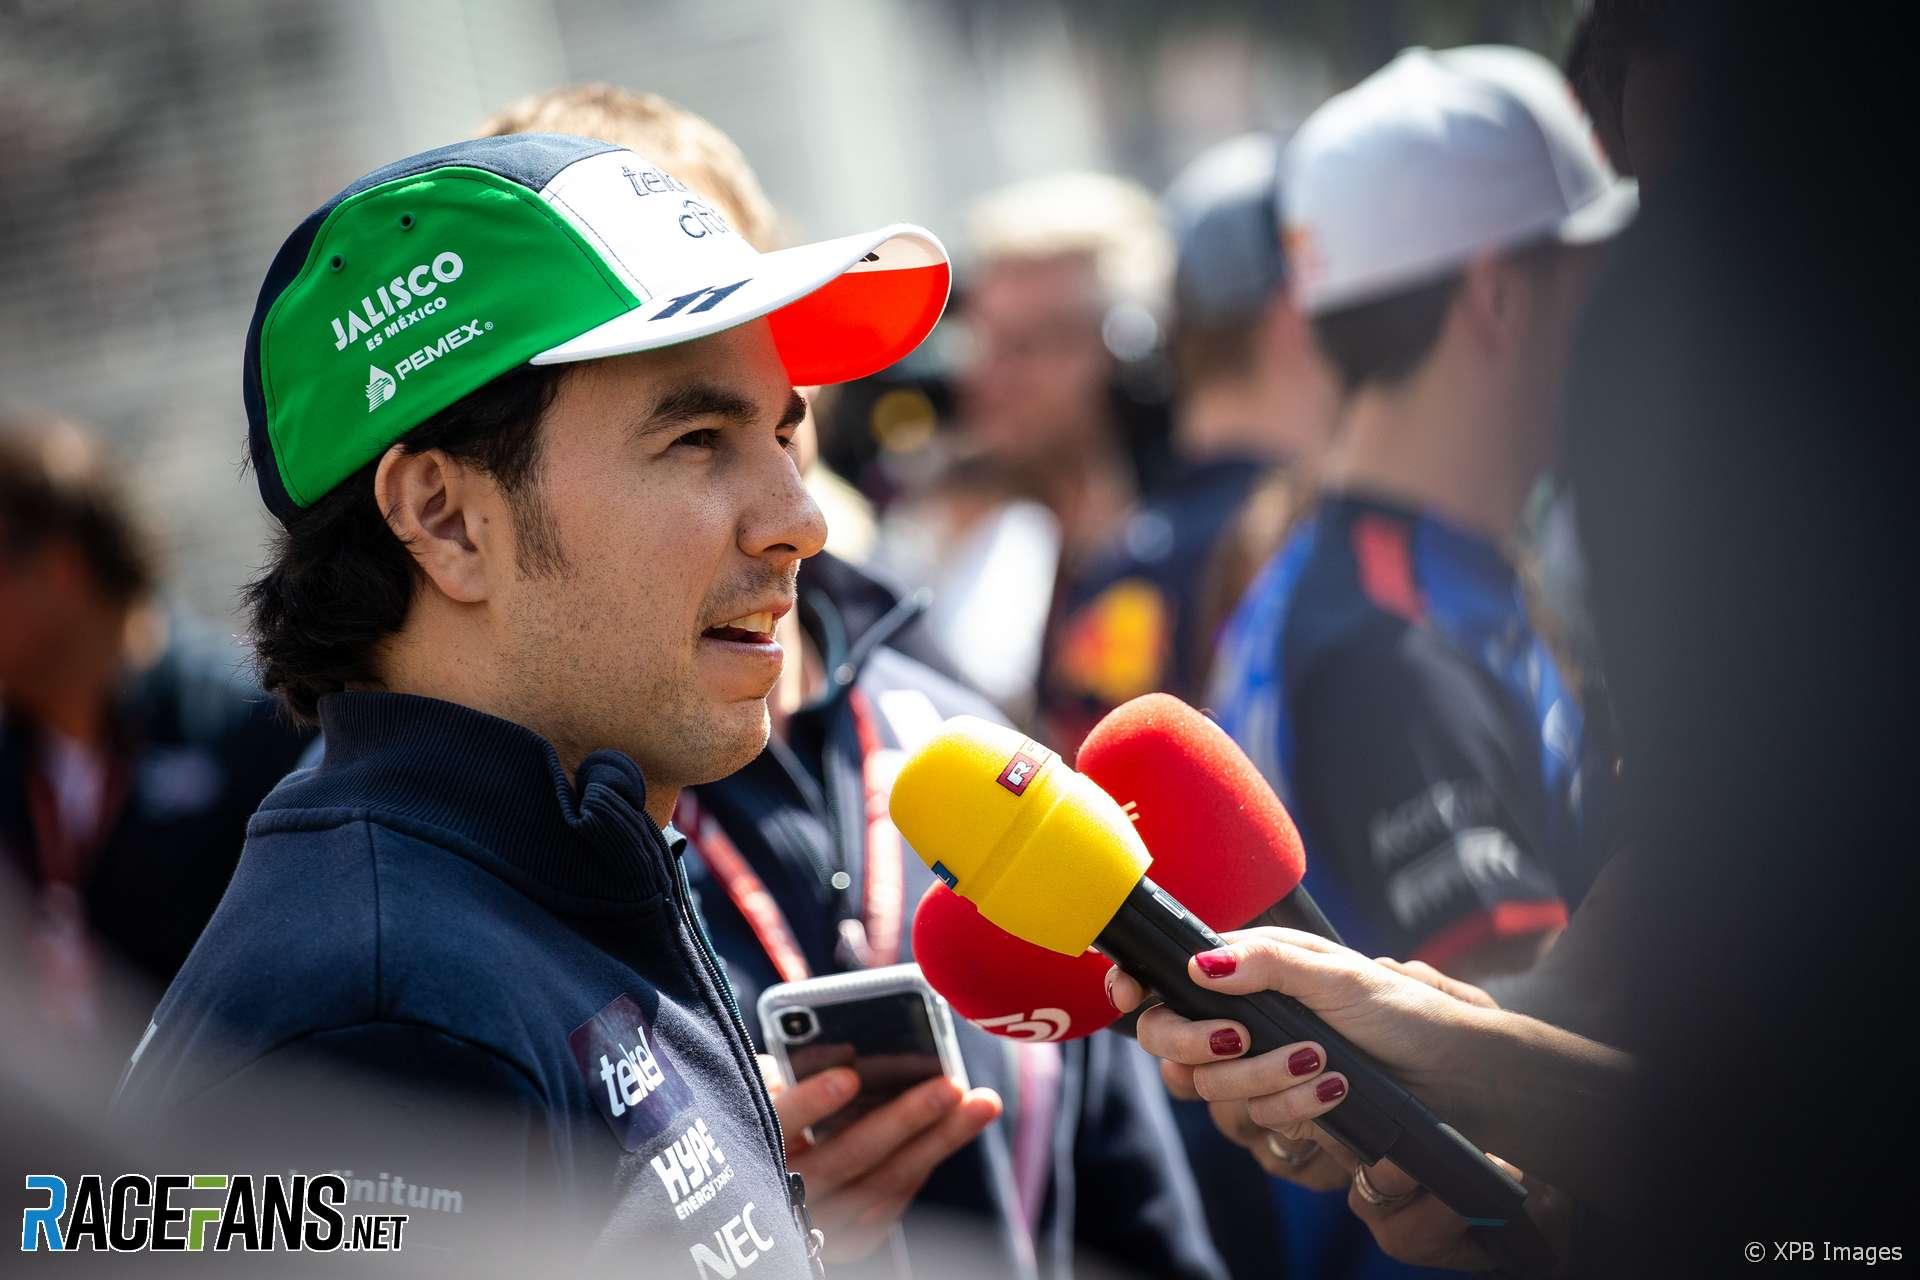 Sergio Perez, Force India, Autodromo Hermanos Rodriguez, 2018